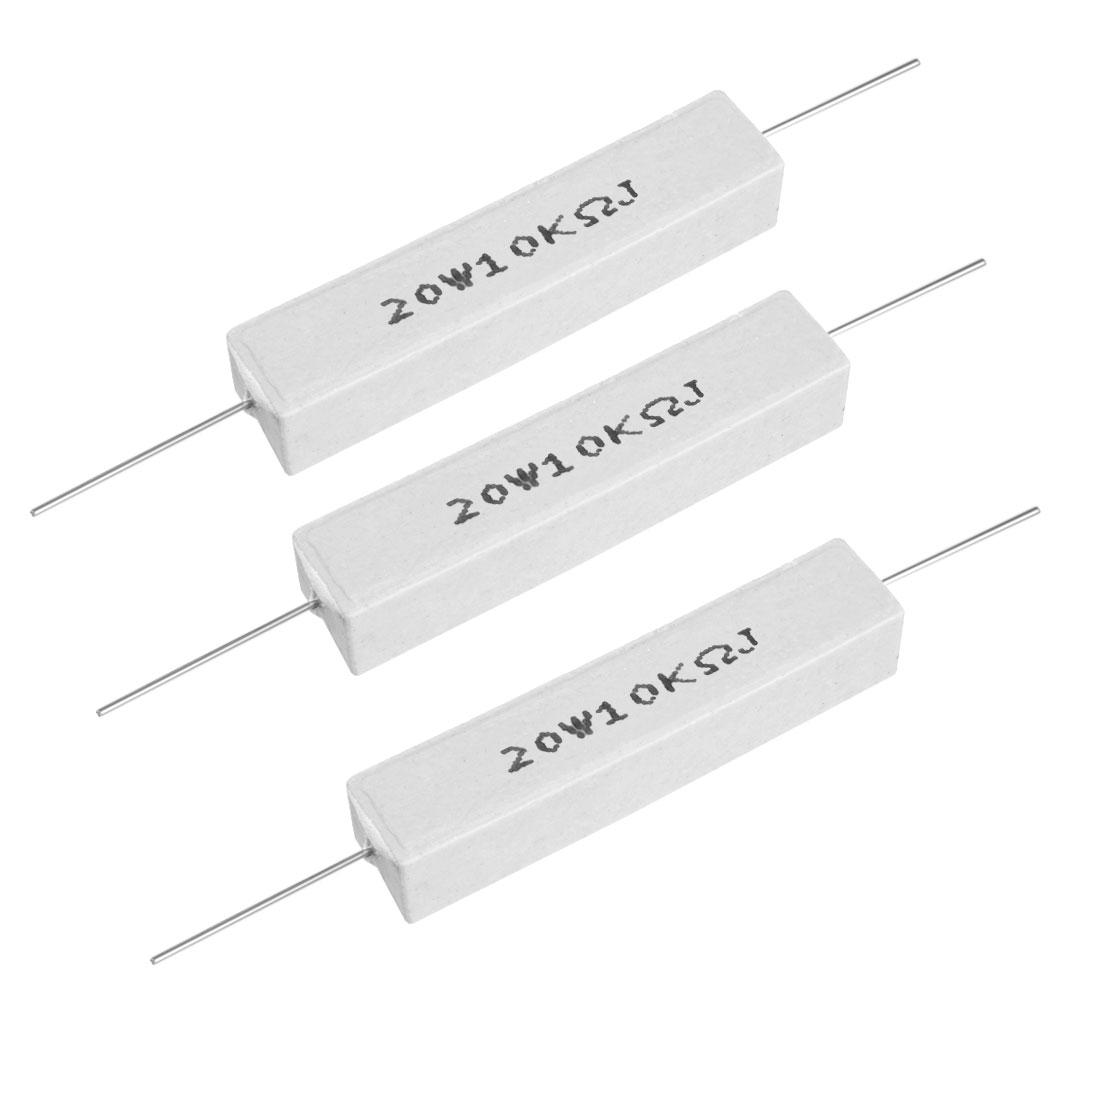 20W 10k Ohm Power Resistor Ceramic Cement Resistor Axial Lead White 3pcs